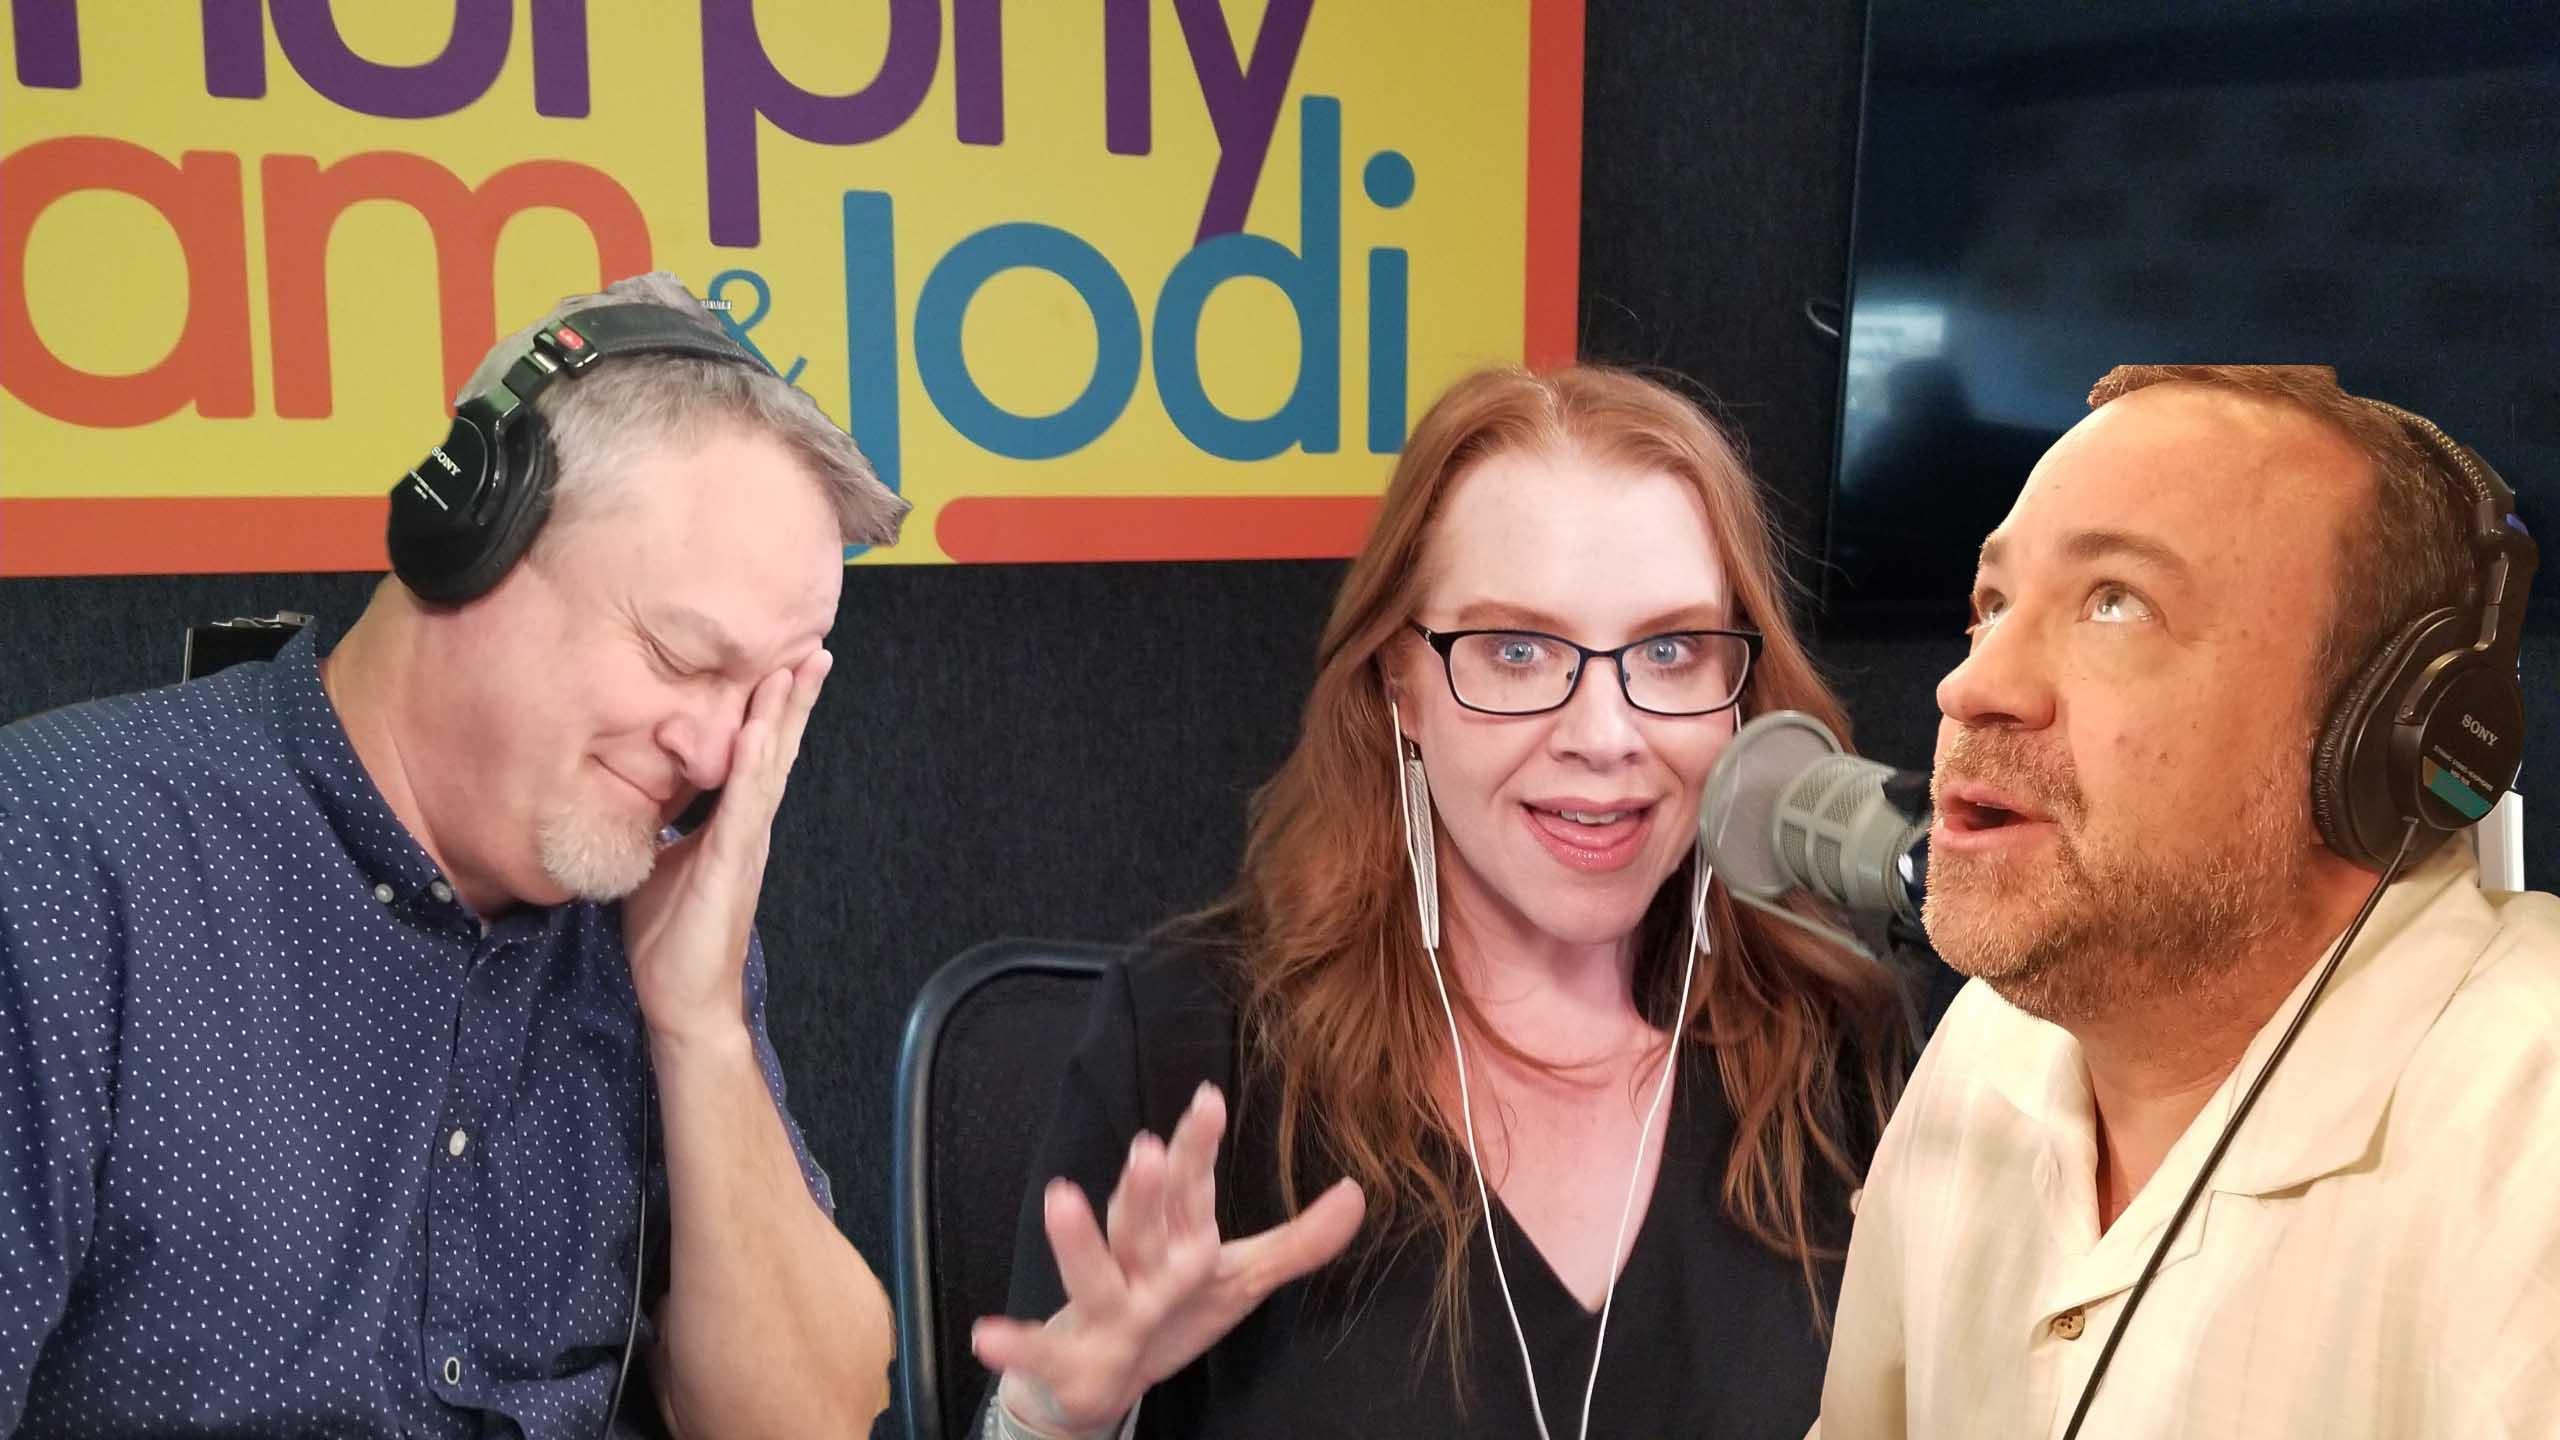 Murphy, Sam & Jody